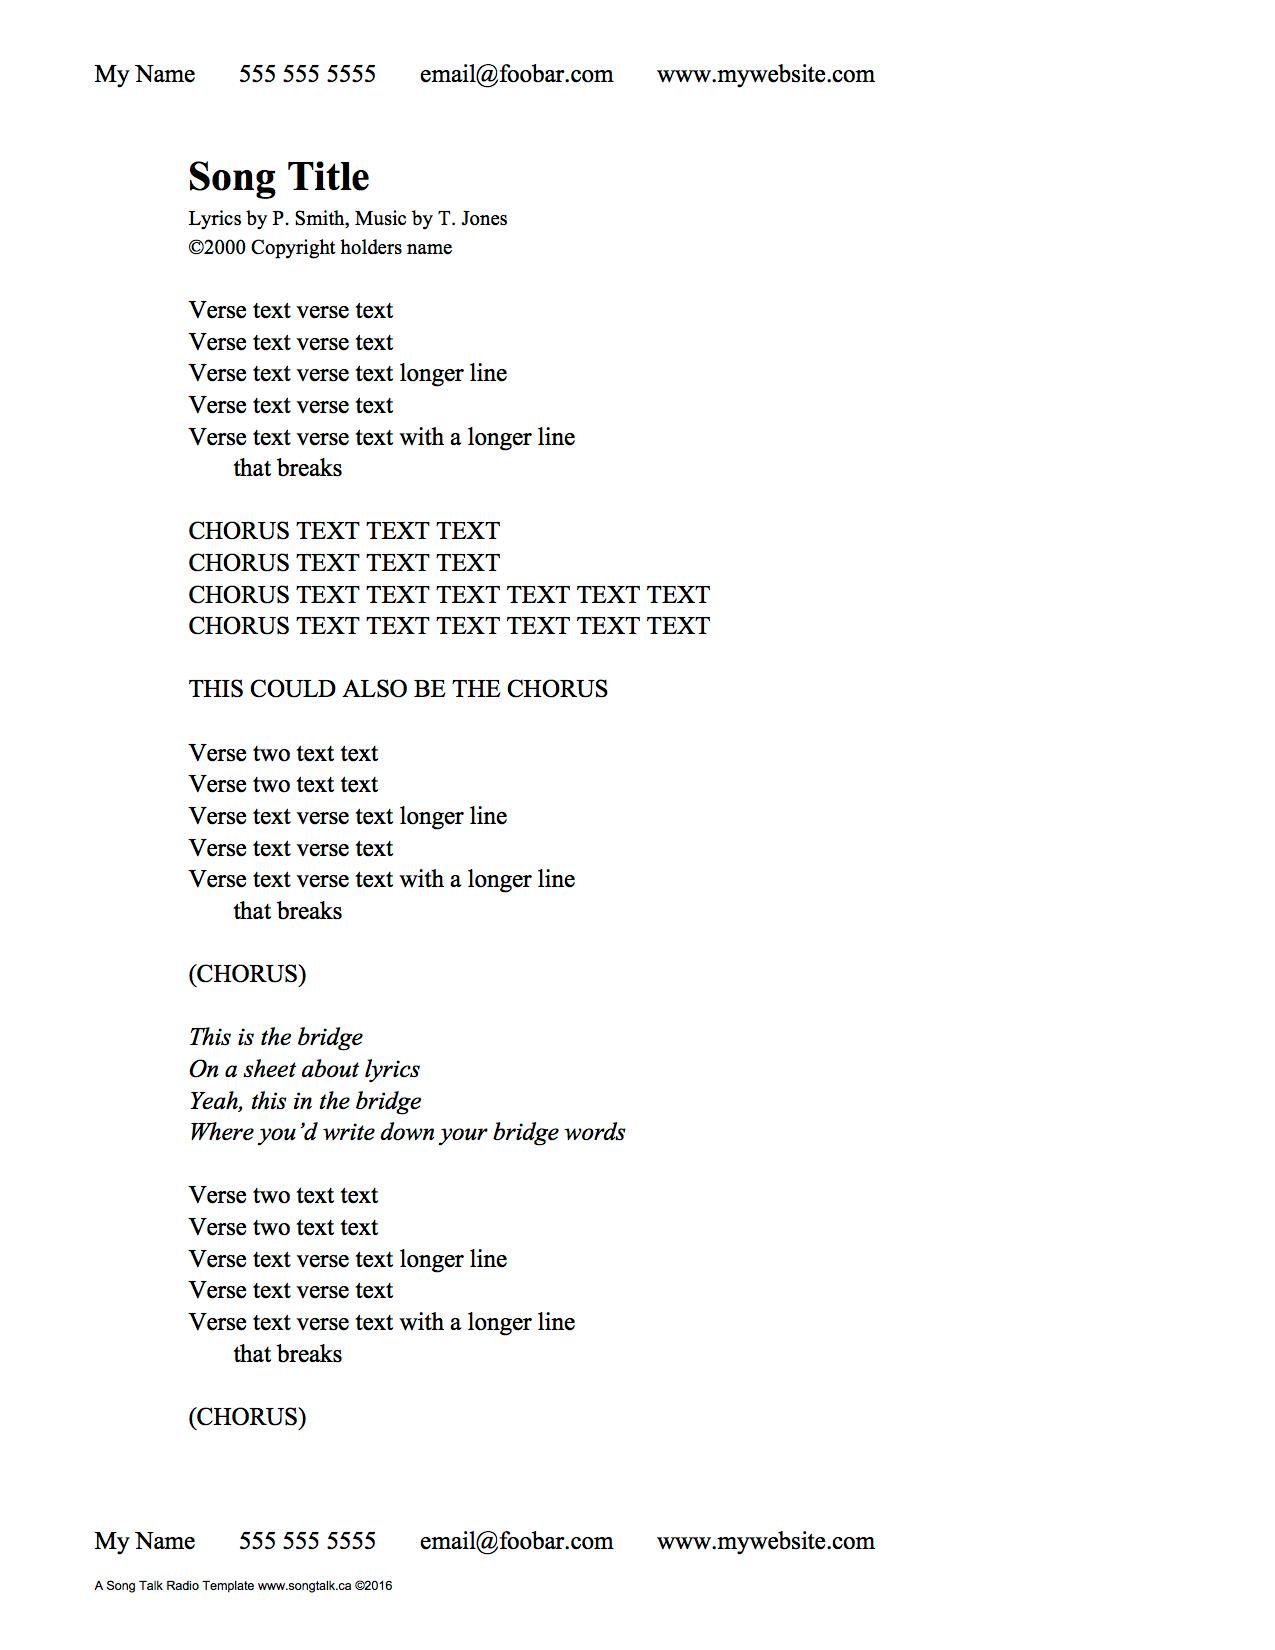 Blank Lyric Sheet Template